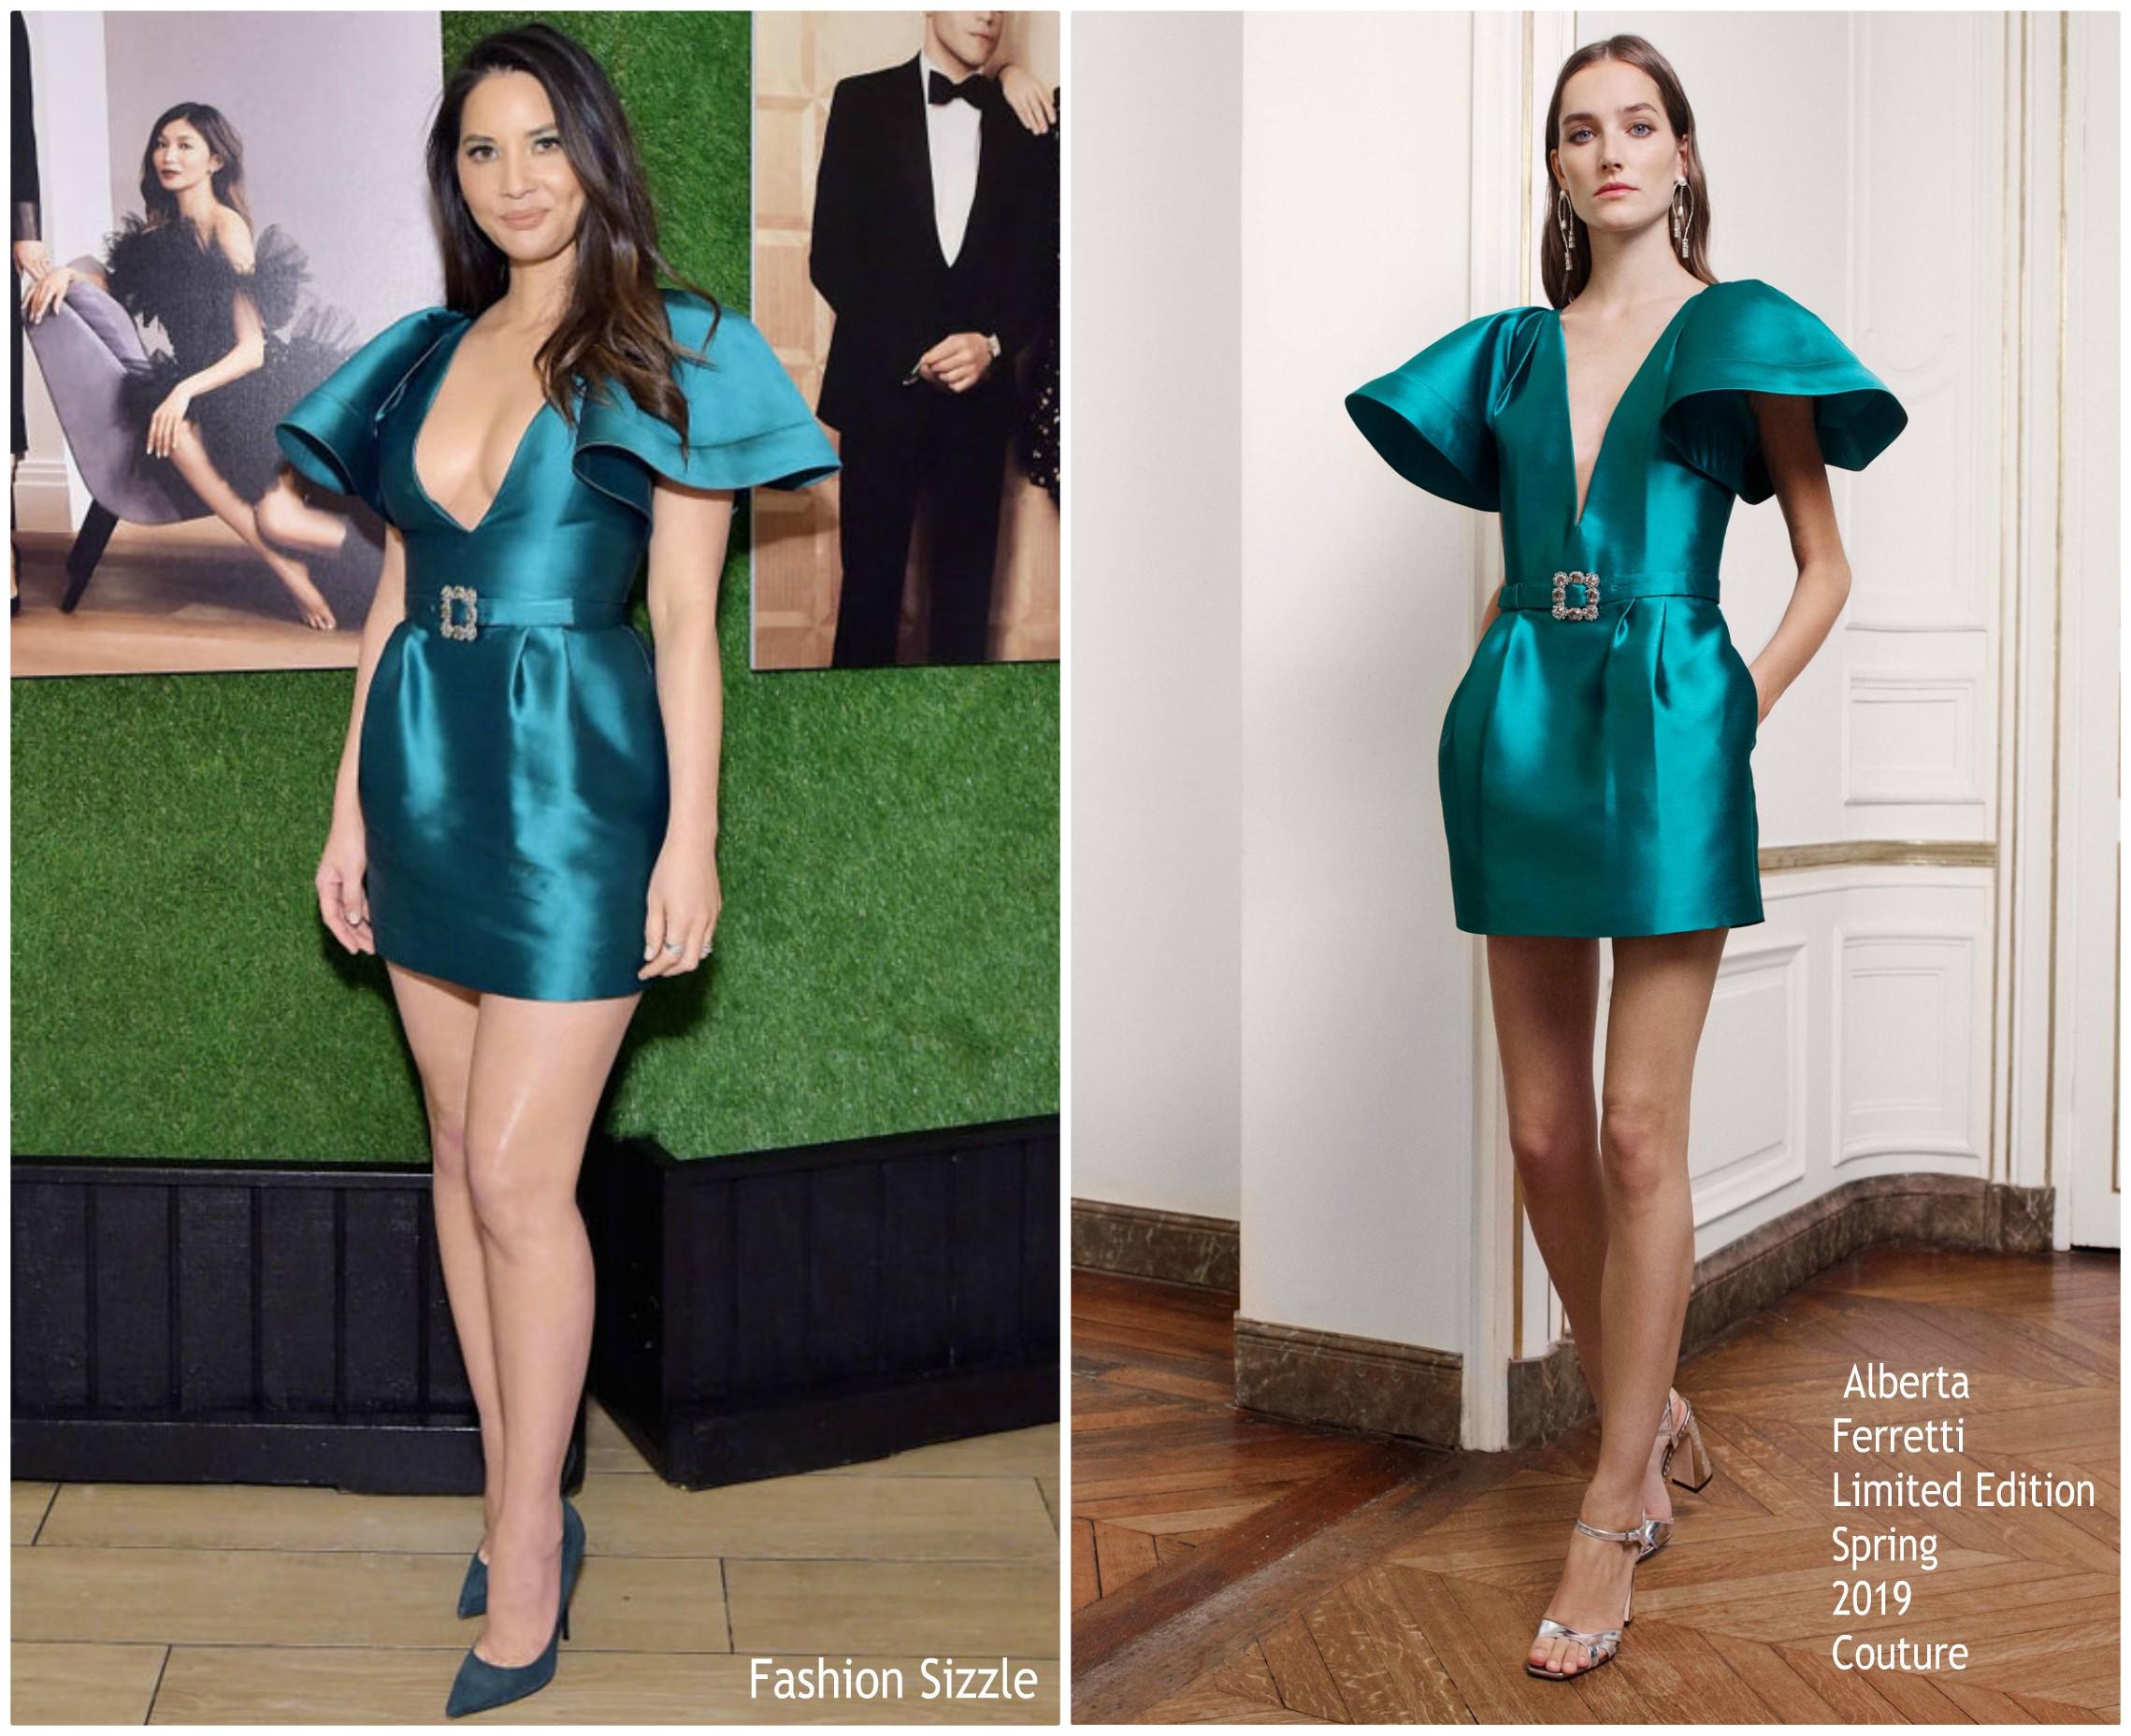 olivia-munn-in-alberta-ferretti-limited-edition-hollywood-reporter-jimmy-choo-power-stylists-dinner